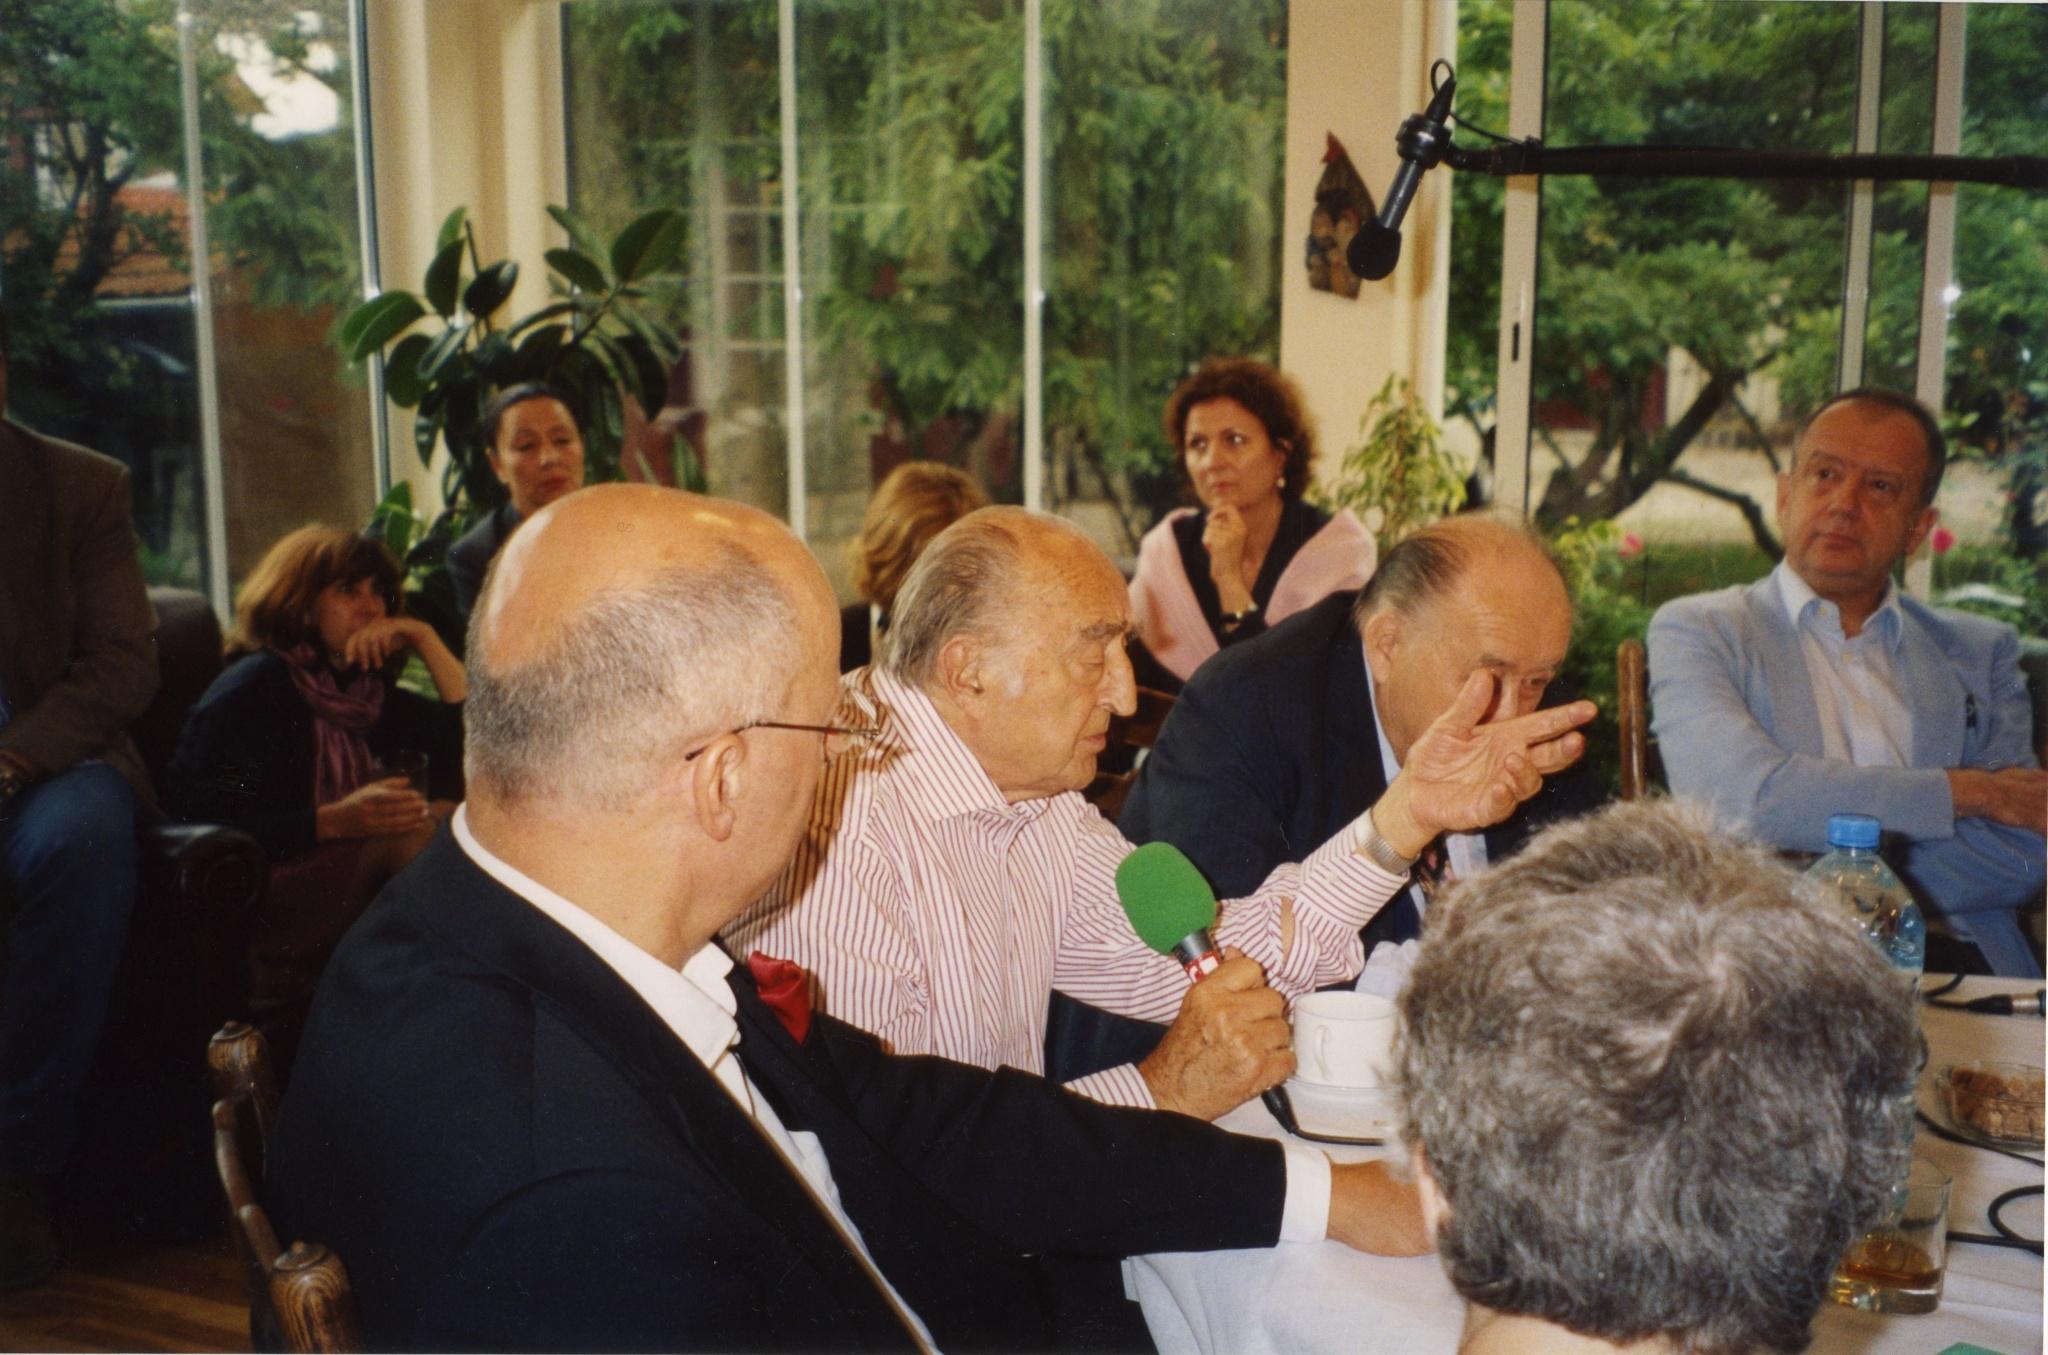 <div class='inner-box'><div class='close-desc'></div><span class='opis'>Konferencja w jardin d&#039;hiver, widoczn: Czesław Bielecki, Leopold Unger, Bohdan Osadczuk, Wojciech Karpiński.</span><div class='clearfix'></div><span>Sygn. FIL03994</span><div class='clearfix'></div><span>&copy; Instytut Literacki</span></div>